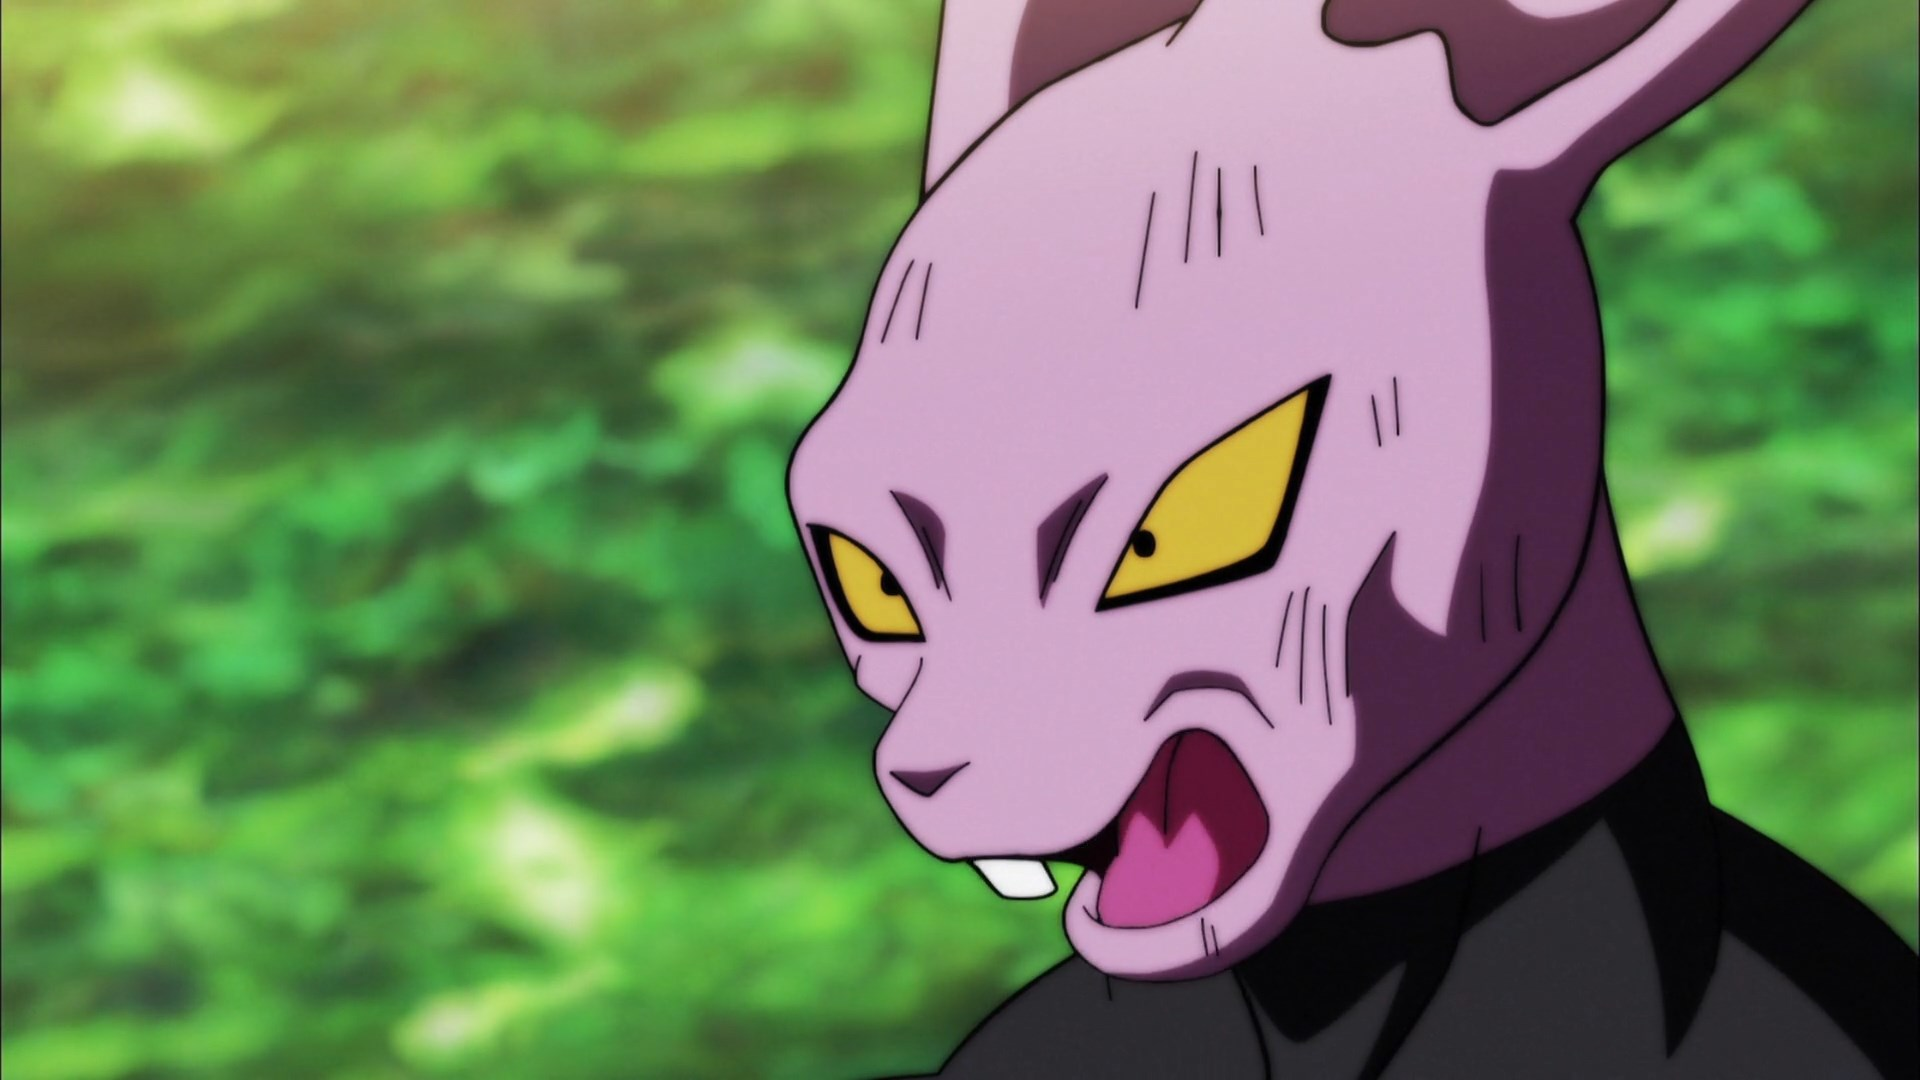 [HorribleSubs] Dragon Ball Super - 121 [1080p].mkv_snapshot_07.02